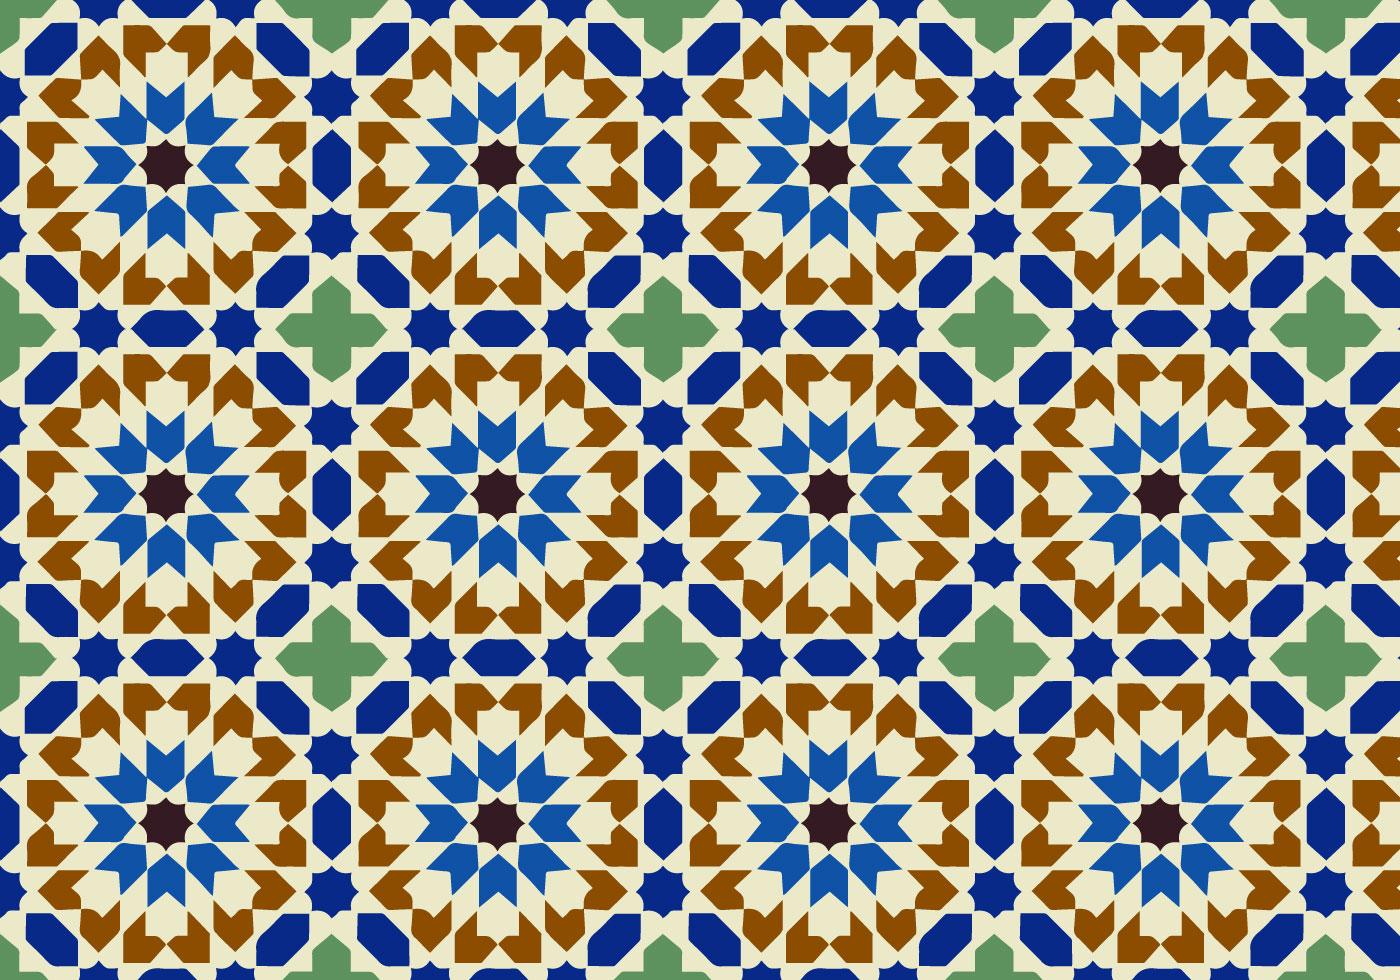 Moroccan Pattern Free Vector Art - (17207 Free Downloads) - Free Printable Moroccan Pattern